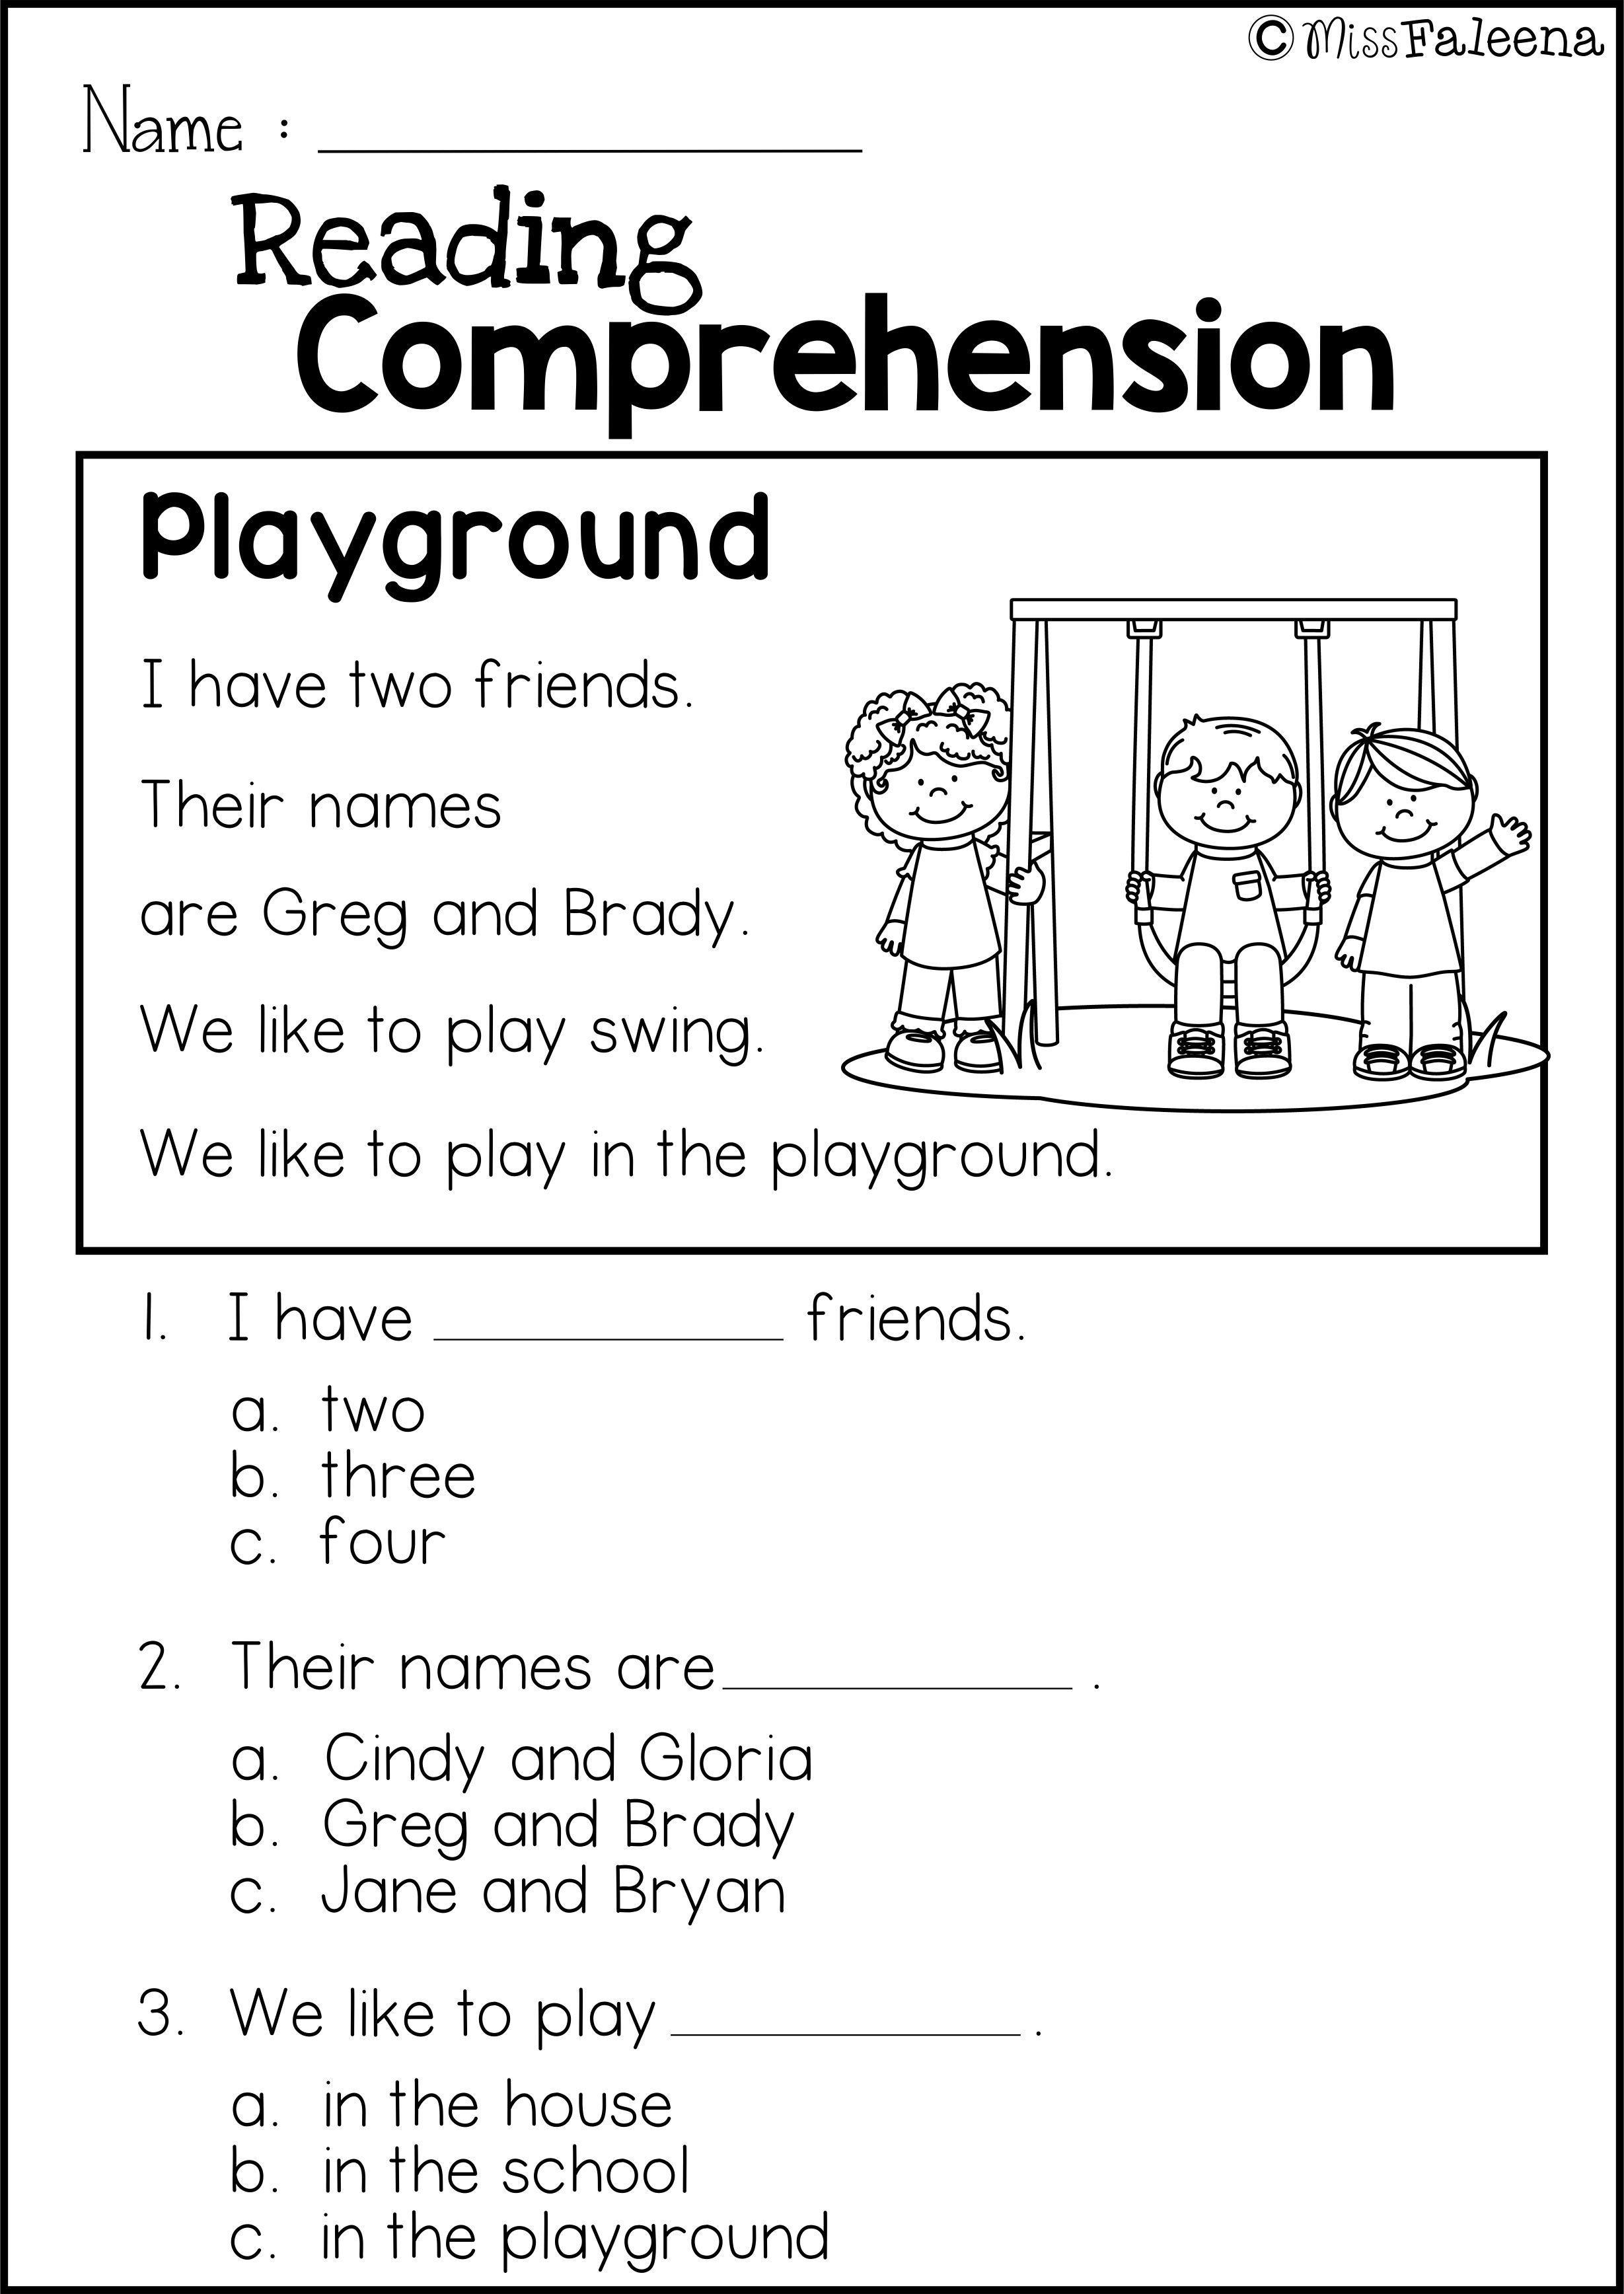 Free Reading Comprehension Practice Worksheets Reading In 2020 Reading Comprehension Practice Comprehension Practice Reading Comprehension [ 3472 x 2458 Pixel ]